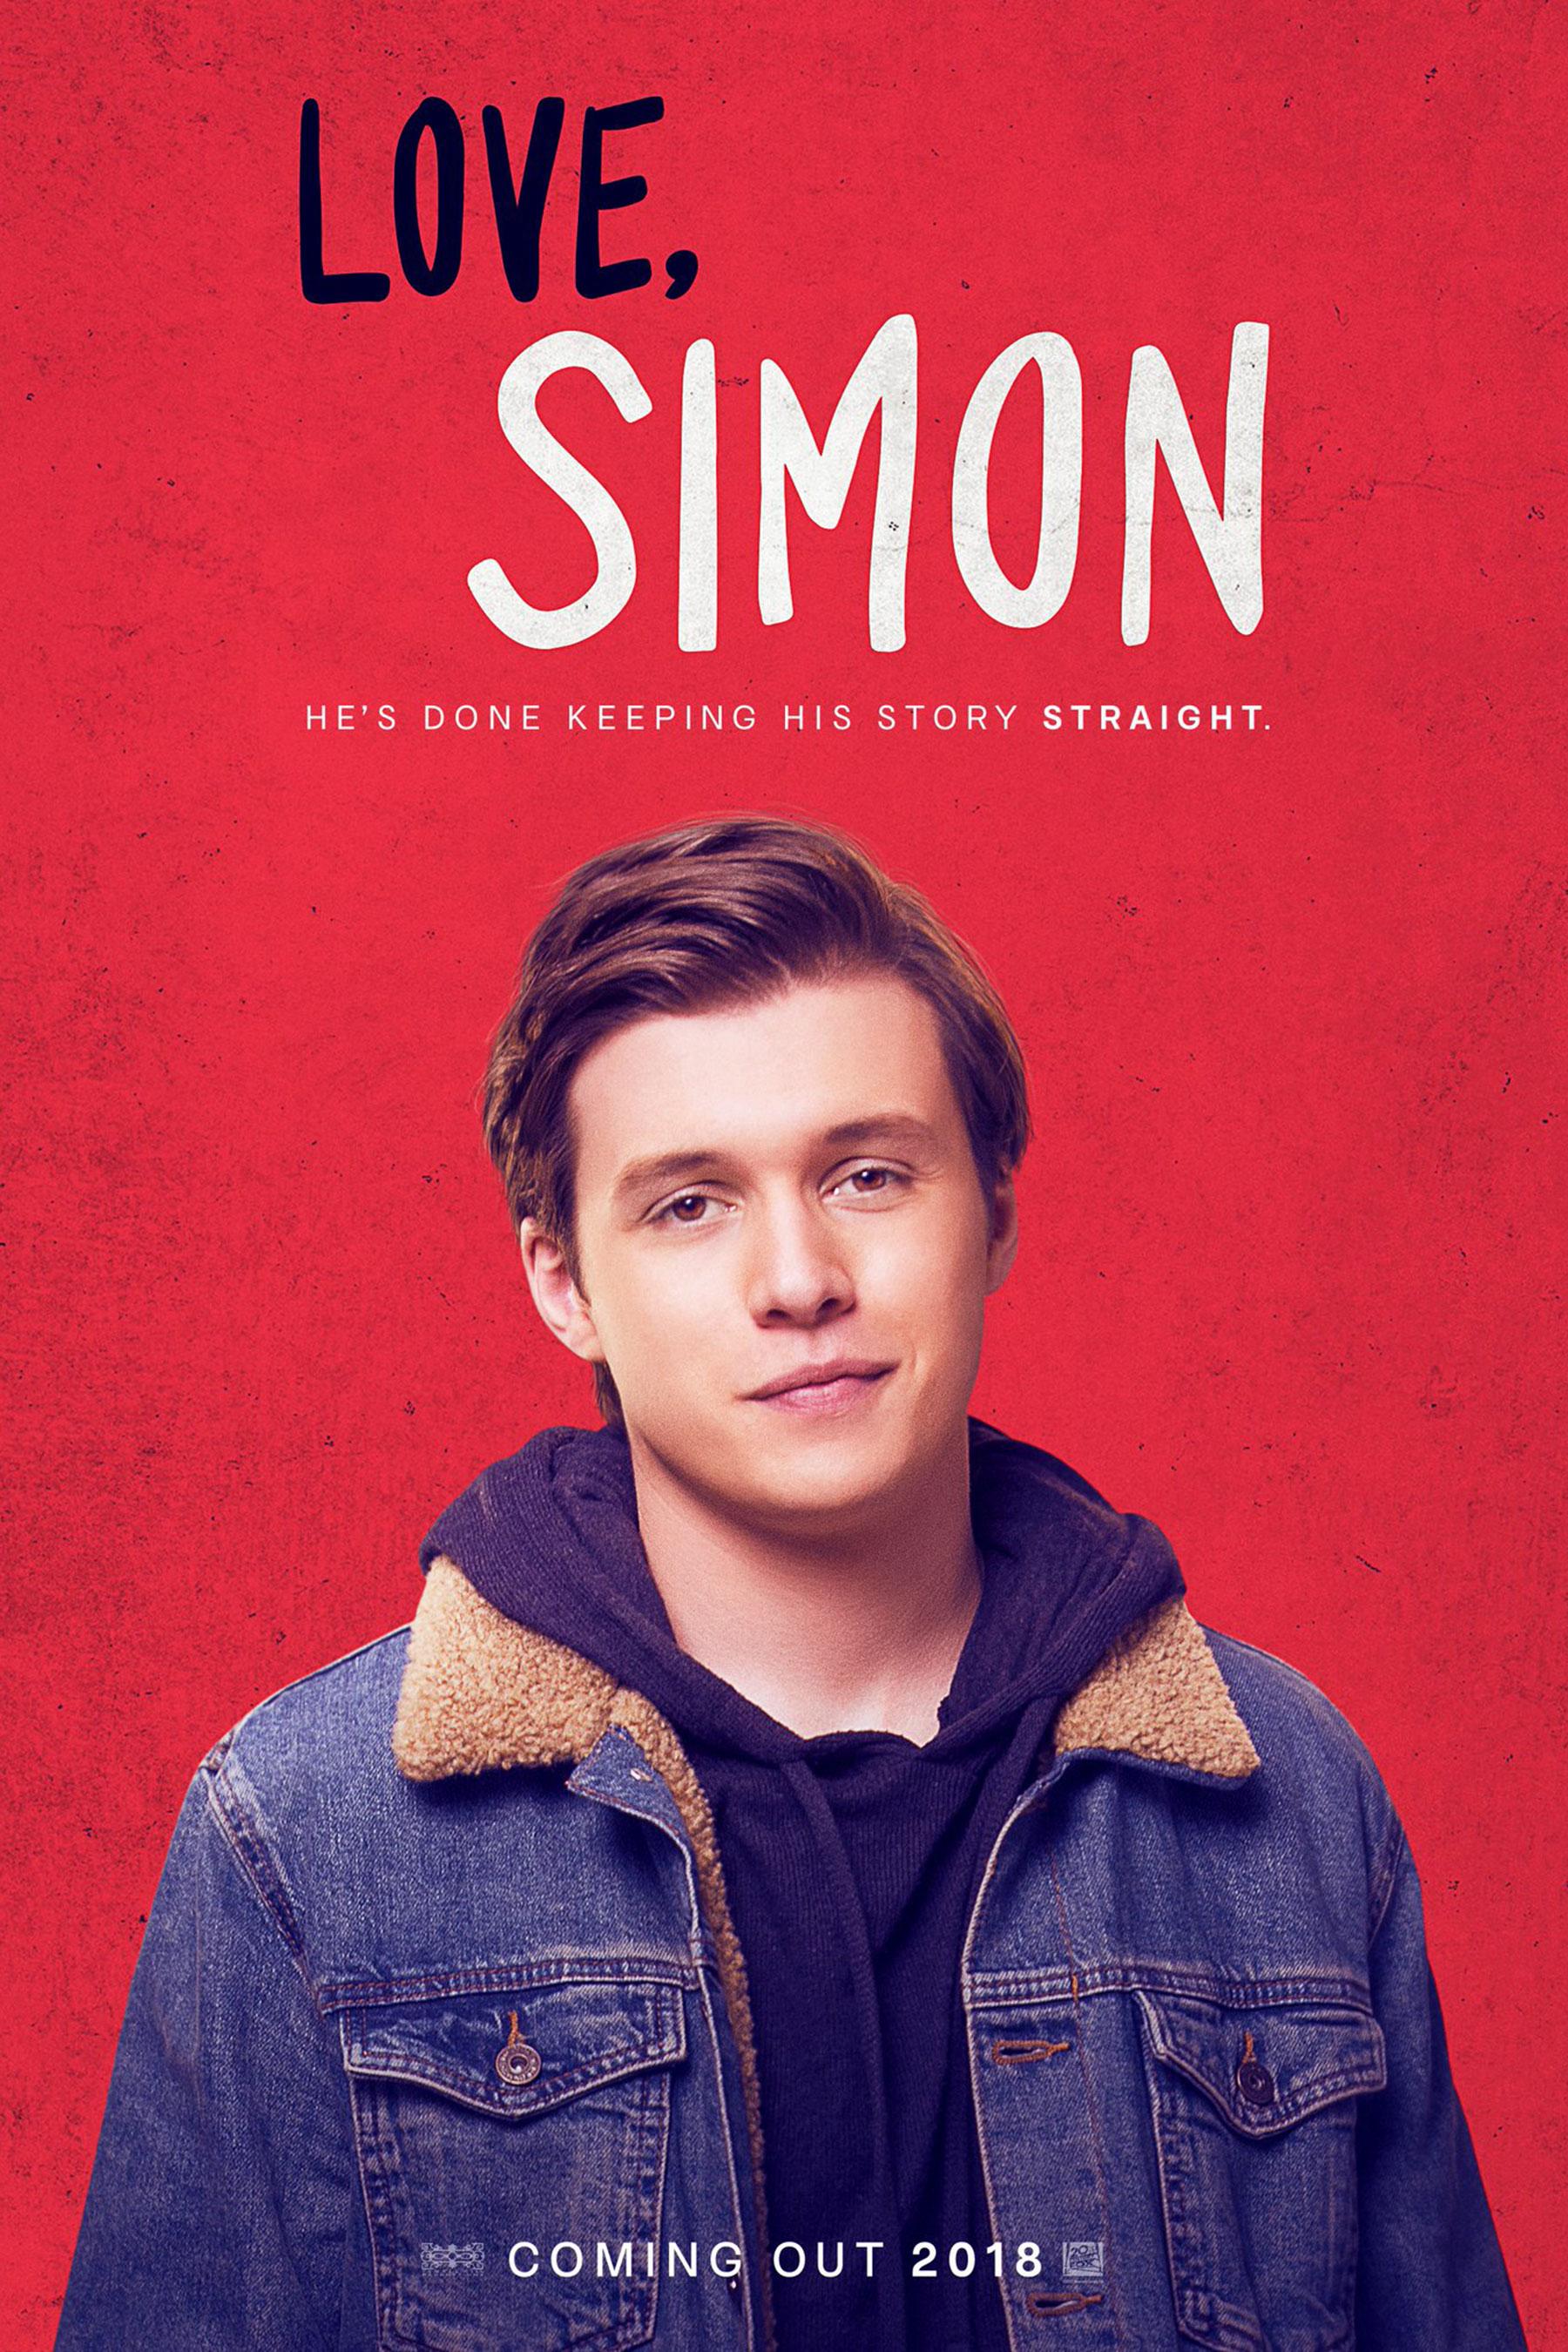 Love, Simon   (2018) dir. Greg Berlanti Rated: PG-13 image:©2018  20th Century Fox